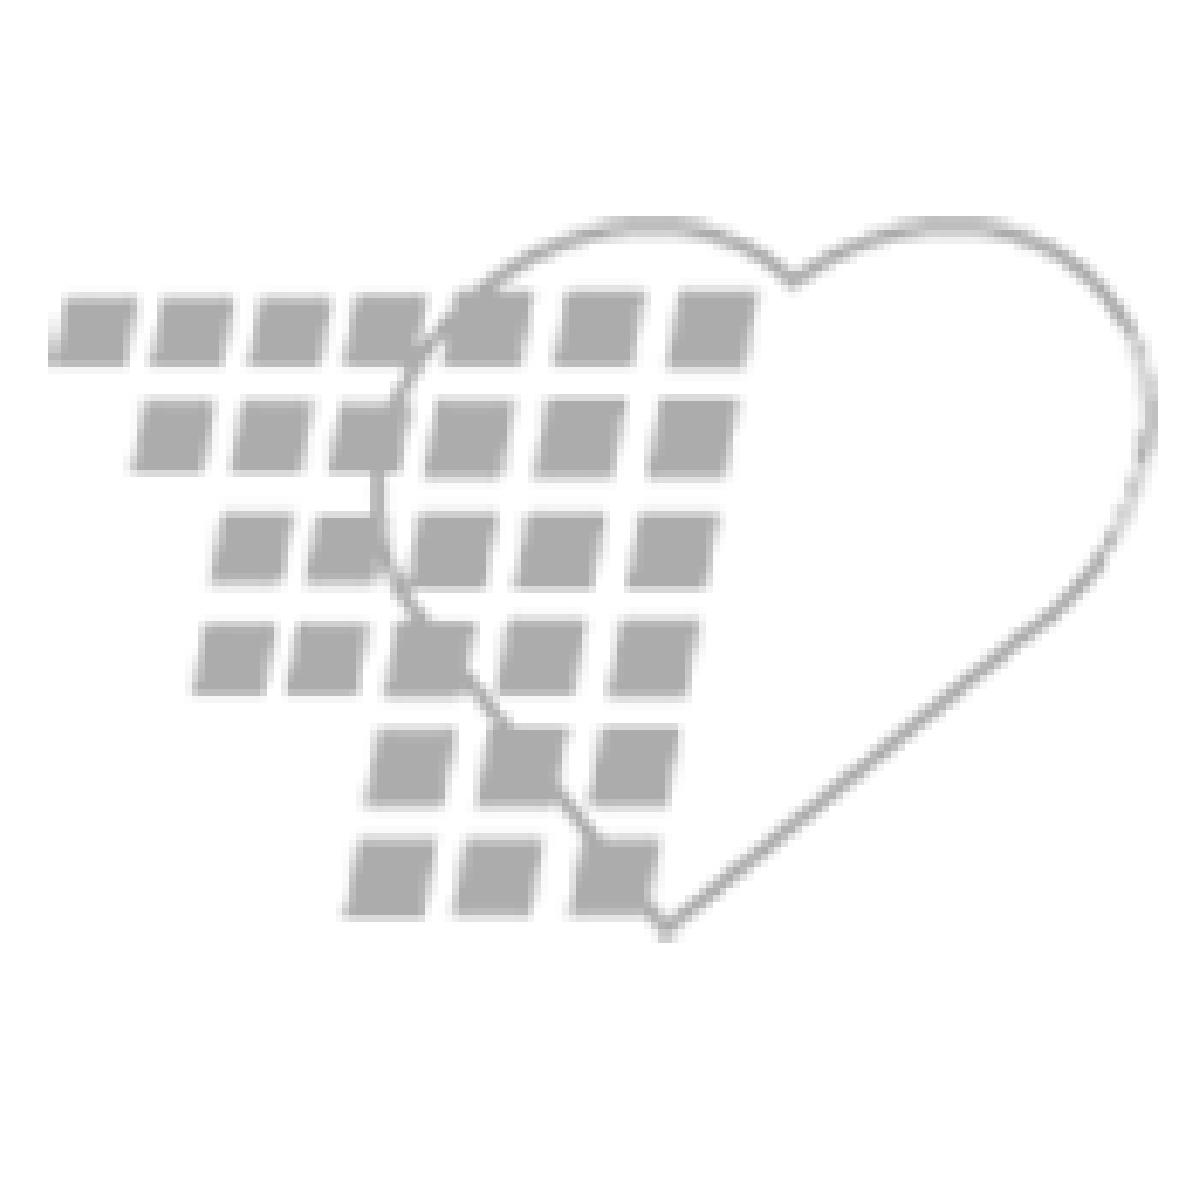 05-44-0020 - Laerdal Stifneck® Pedi-Select Collar